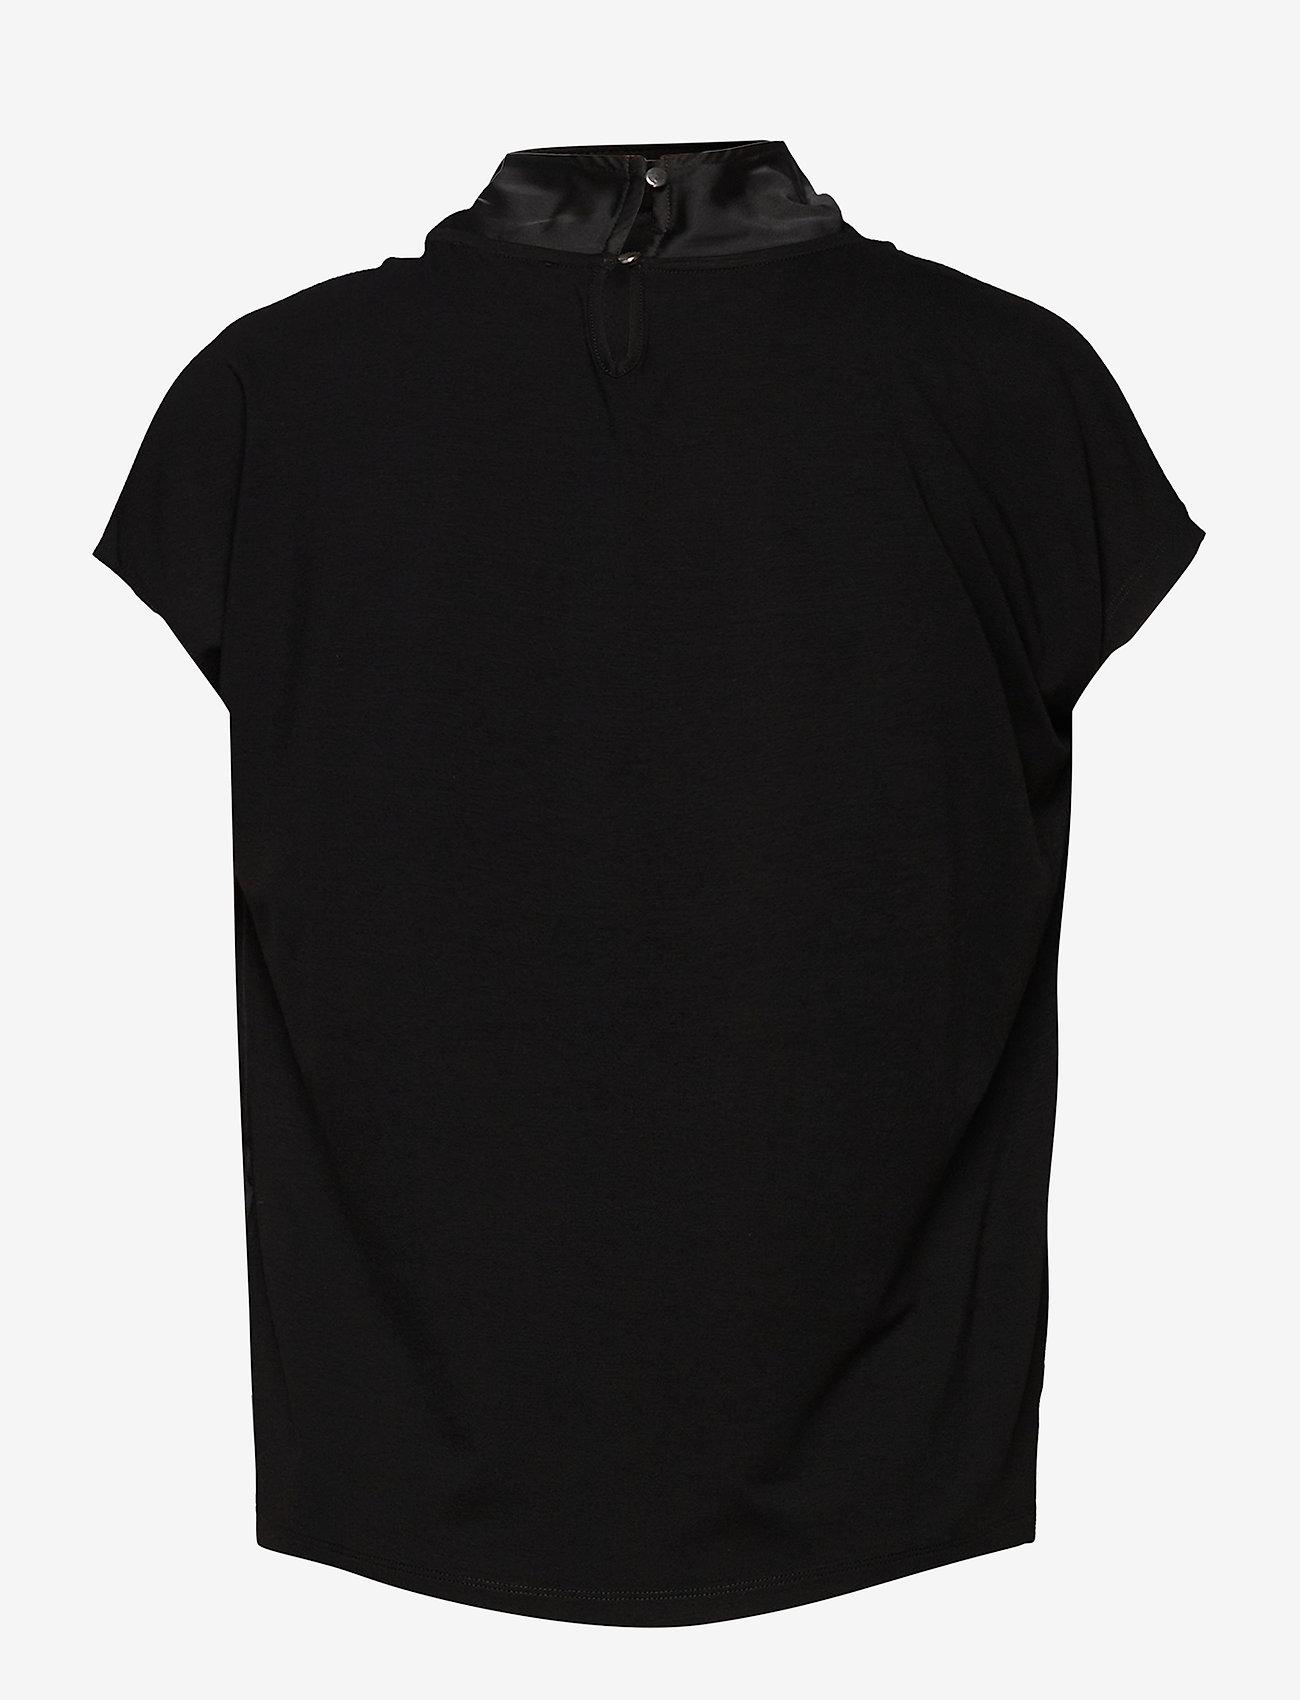 Taifun - T-SHIRT SHORT-SLEEVE - t-shirts - black - 1